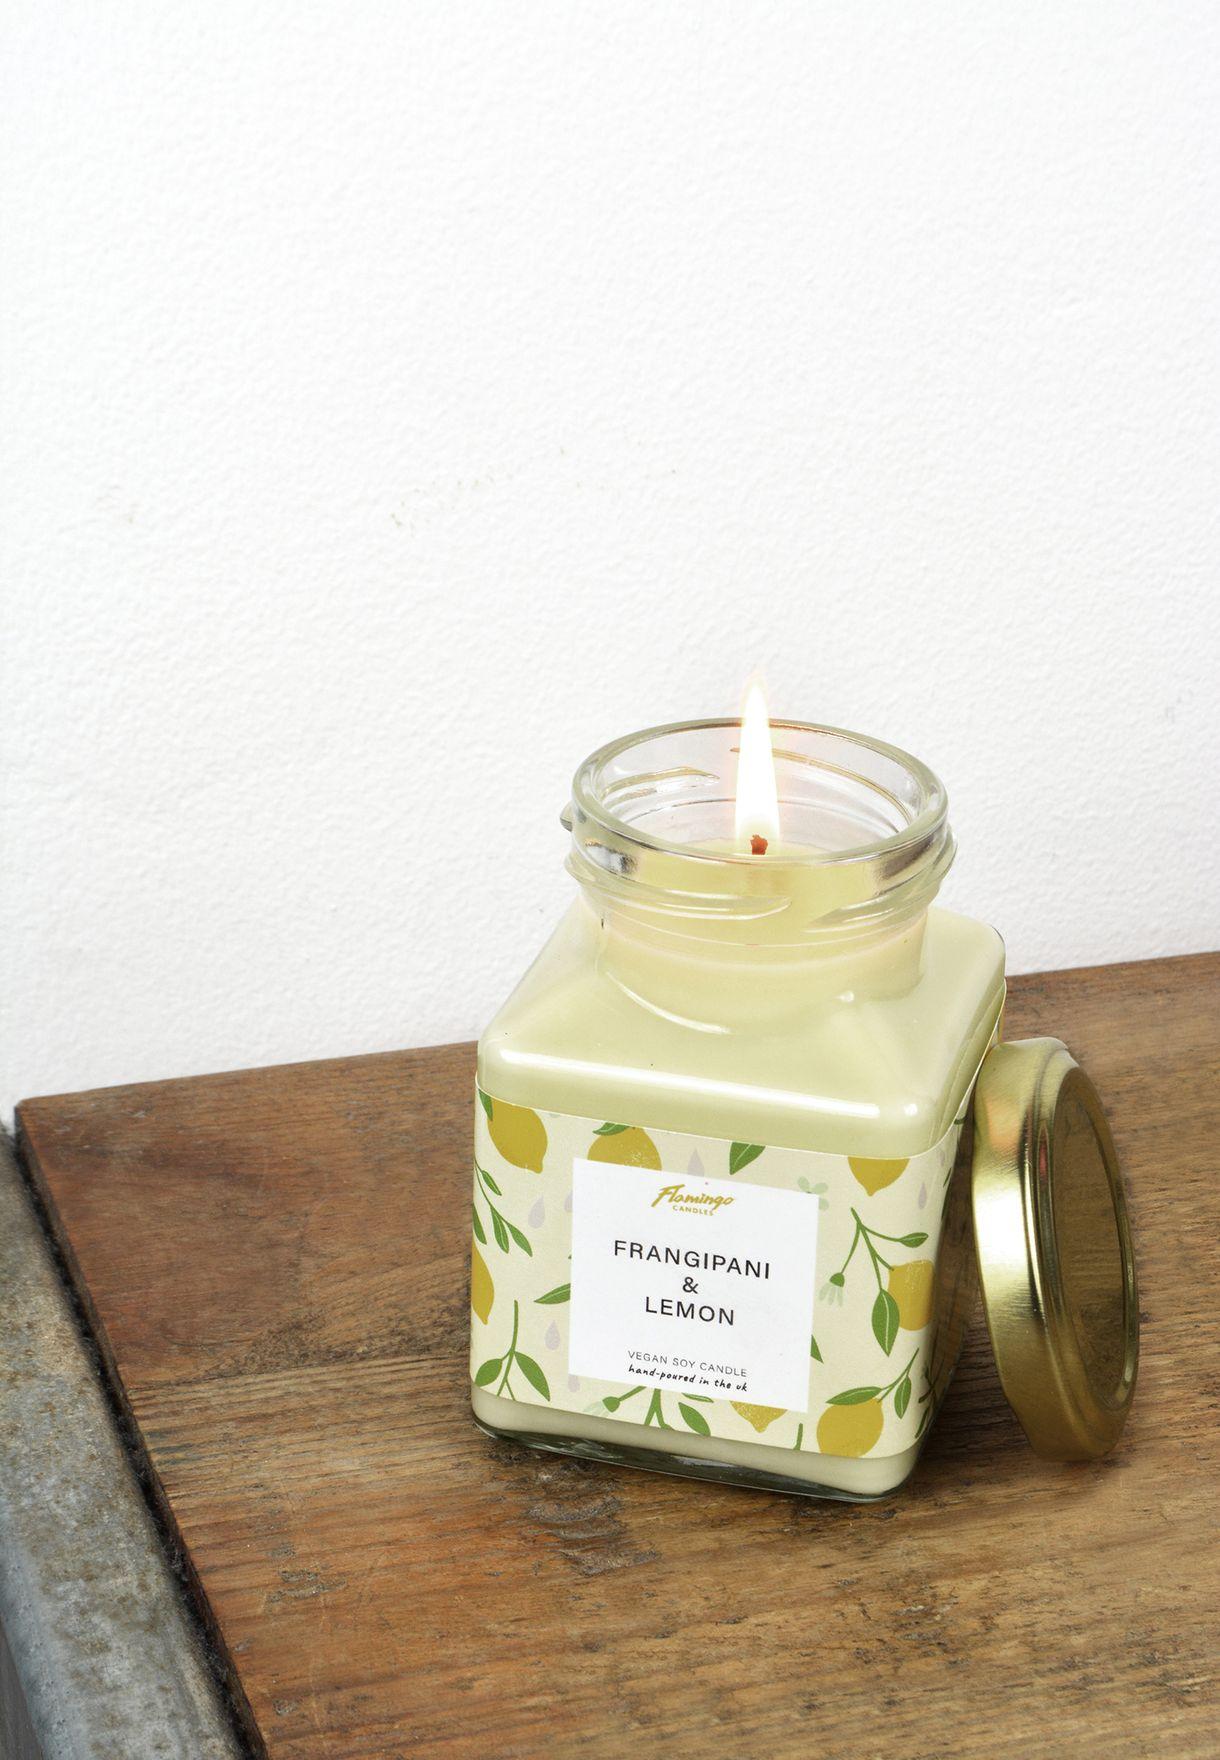 Frangipani & Lemon Candle 8oz